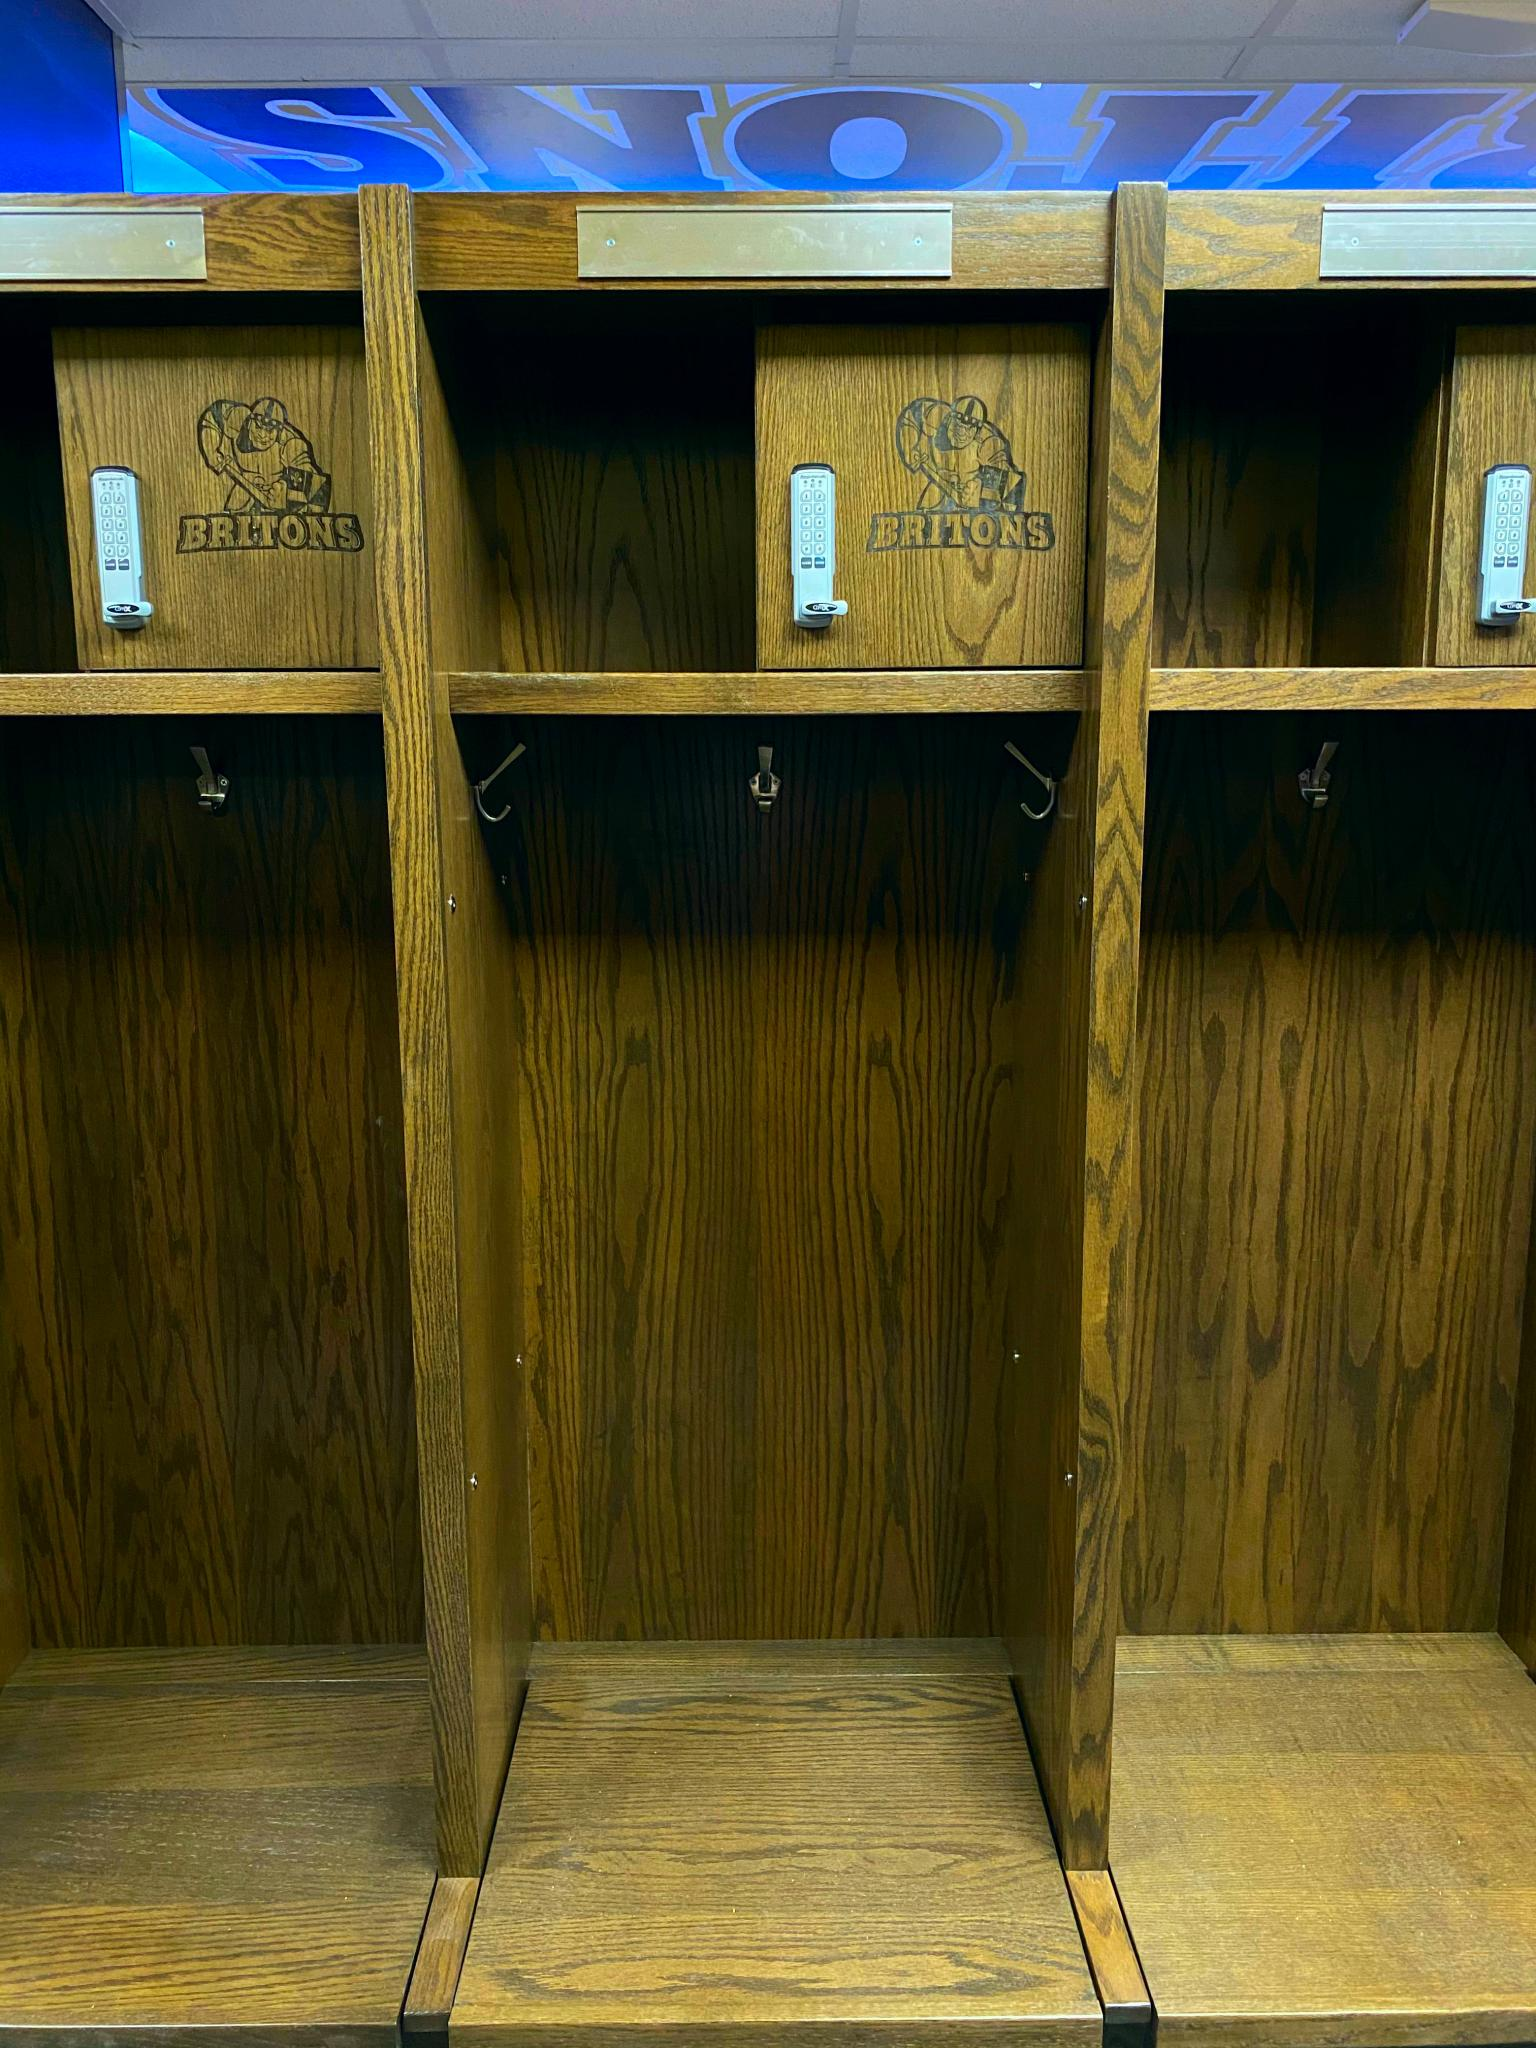 image of wooden lockers